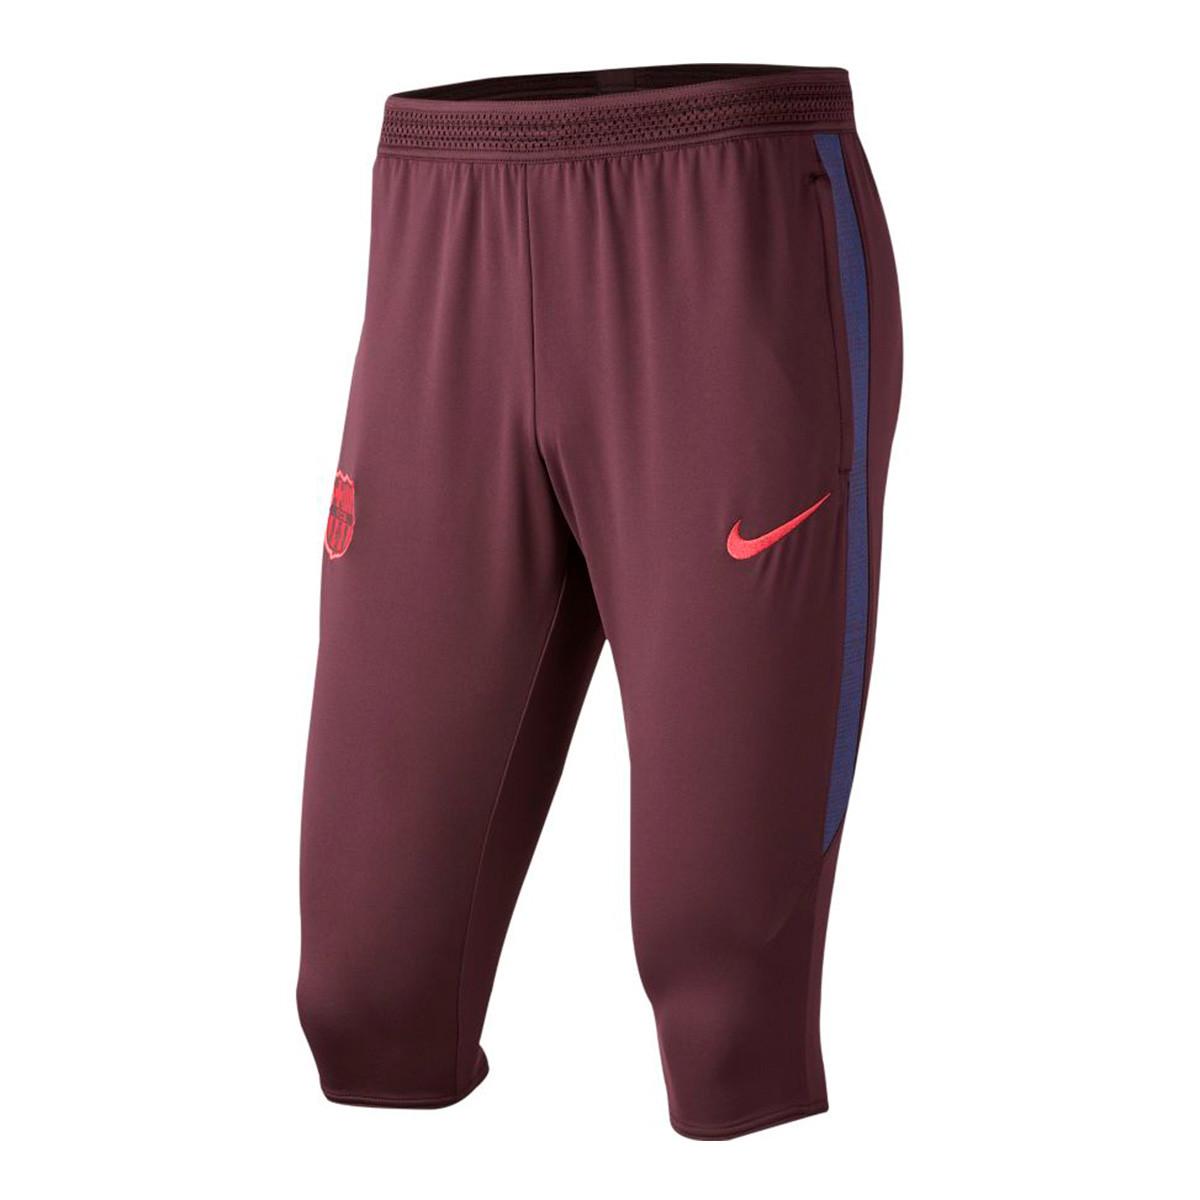 combate Peladura ecuador  Capri pants Nike FC Barcelona Dry Strike 2019-2020 Burgundy ash-Deep royal  blue-Noble red - Football store Fútbol Emotion